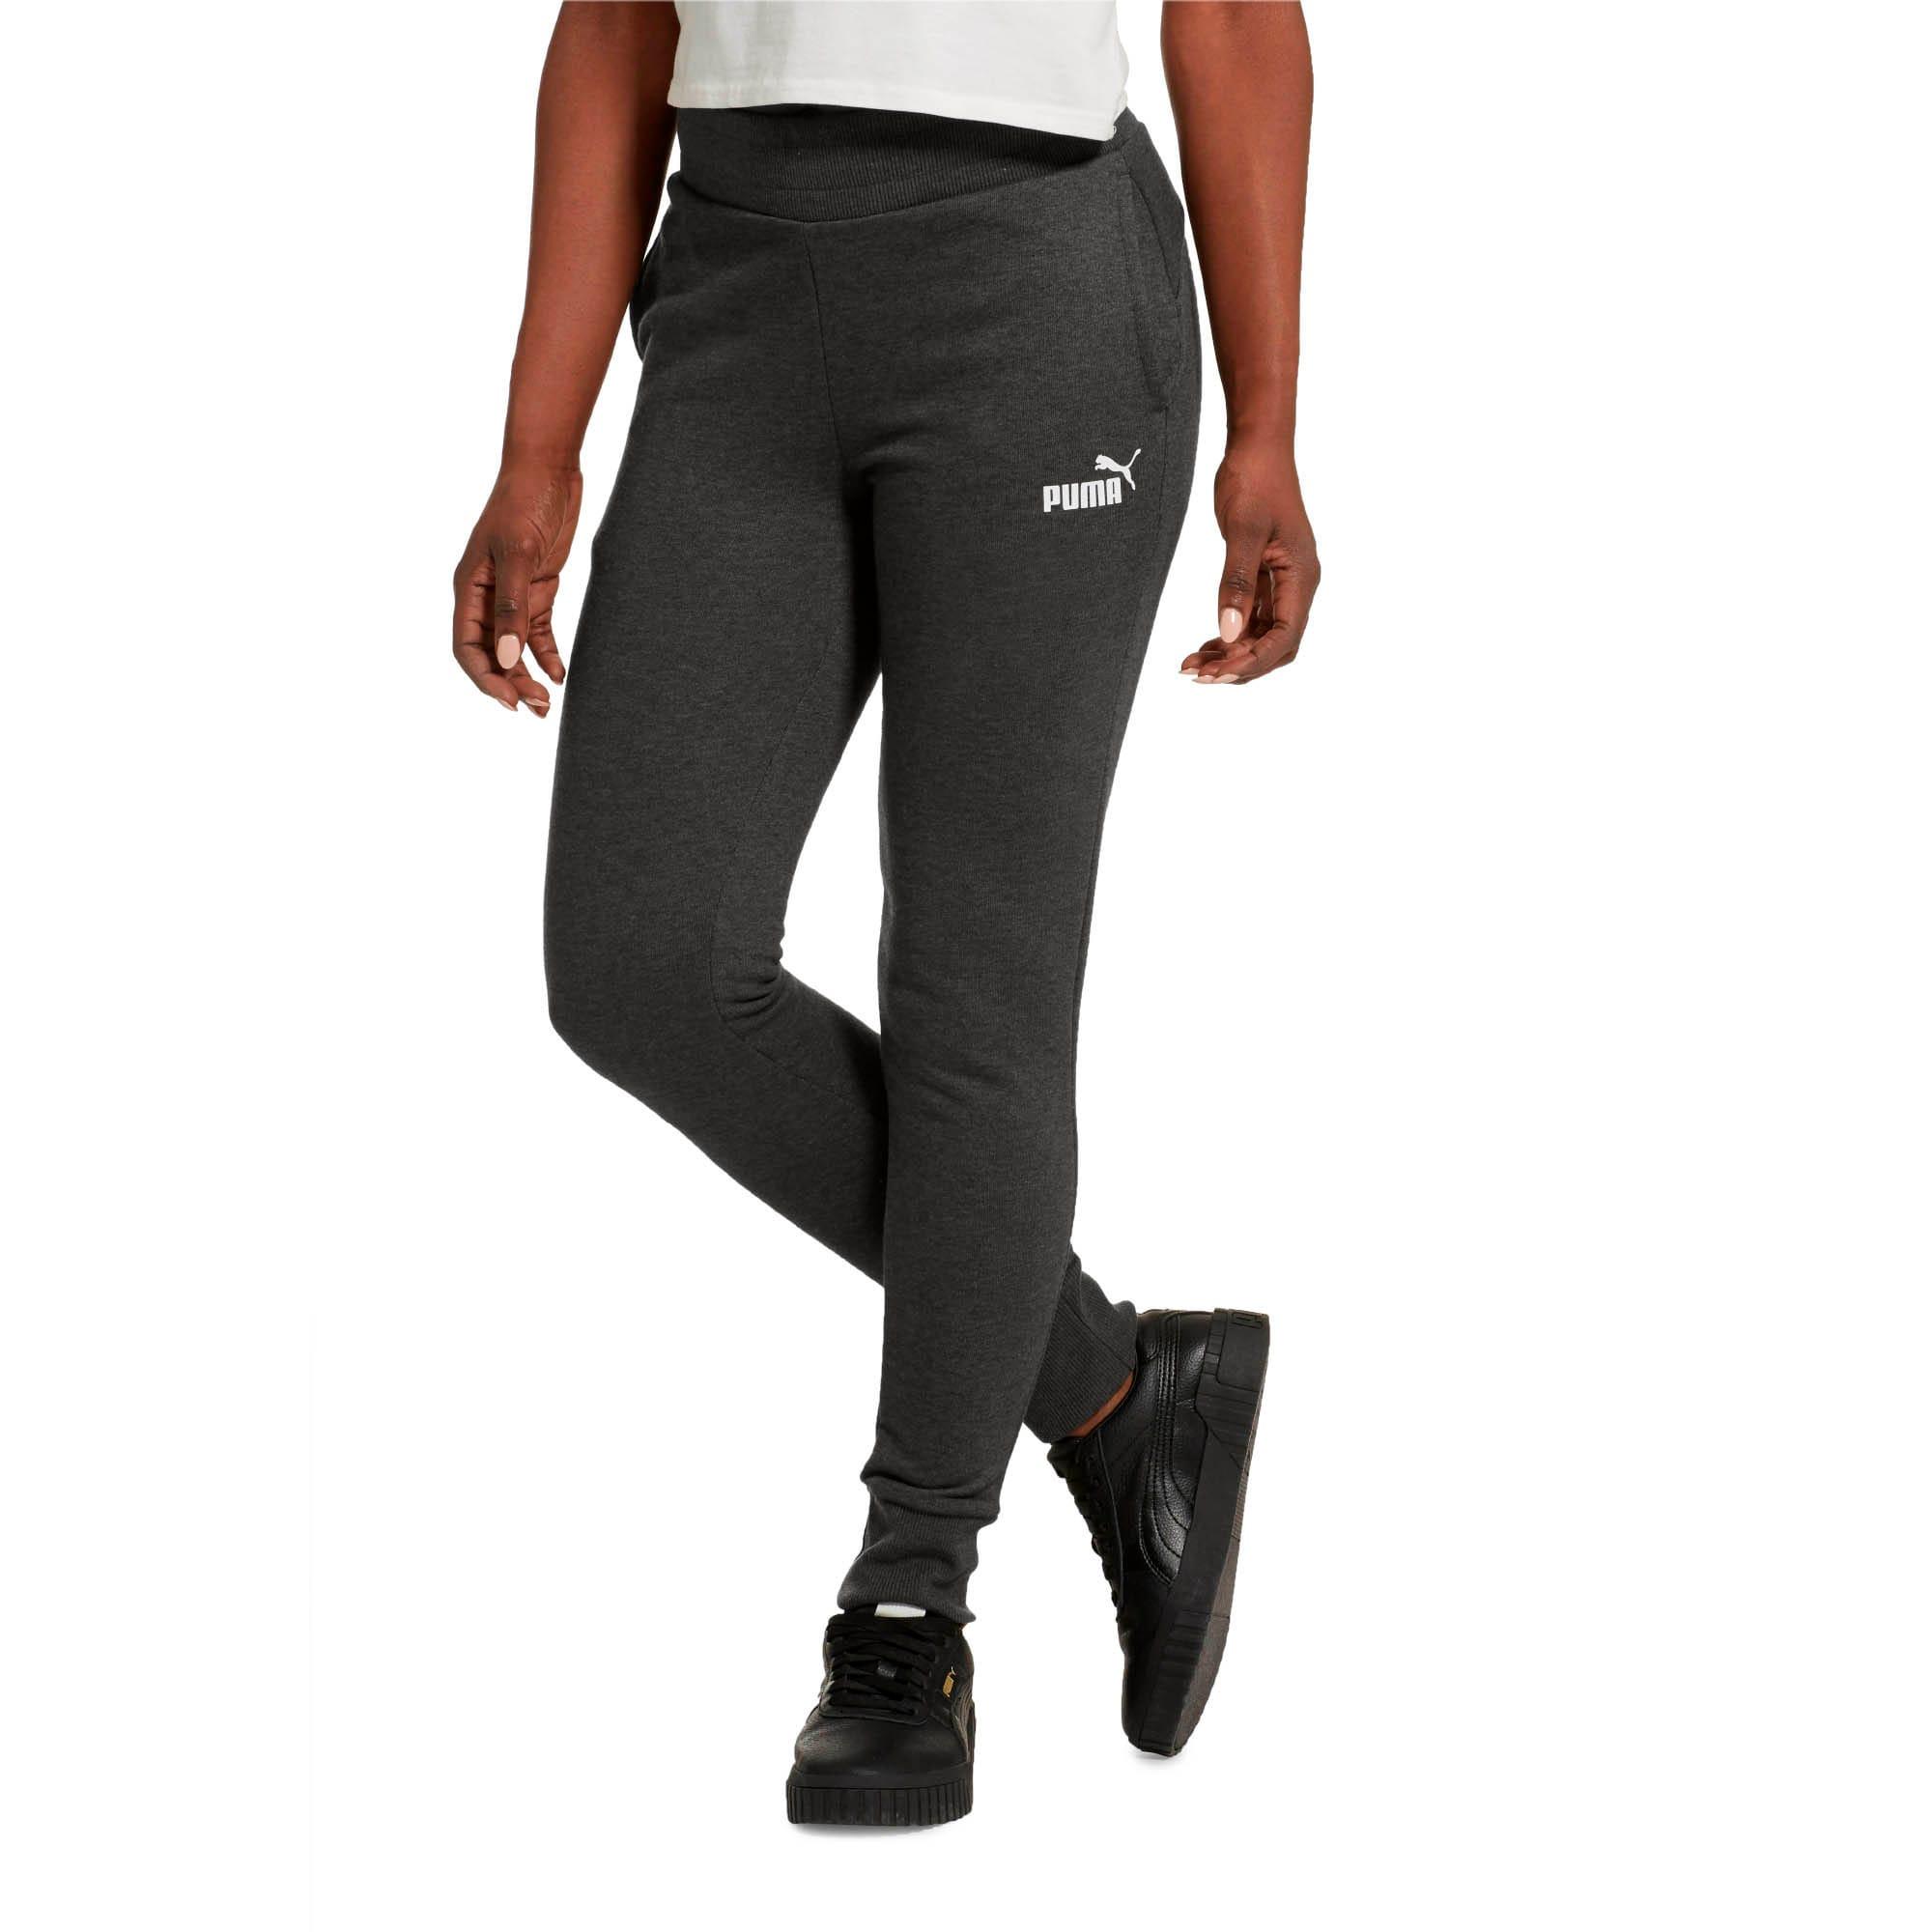 Thumbnail 2 of Essentials Women's Sweatpants, Dark Gray Heather, medium